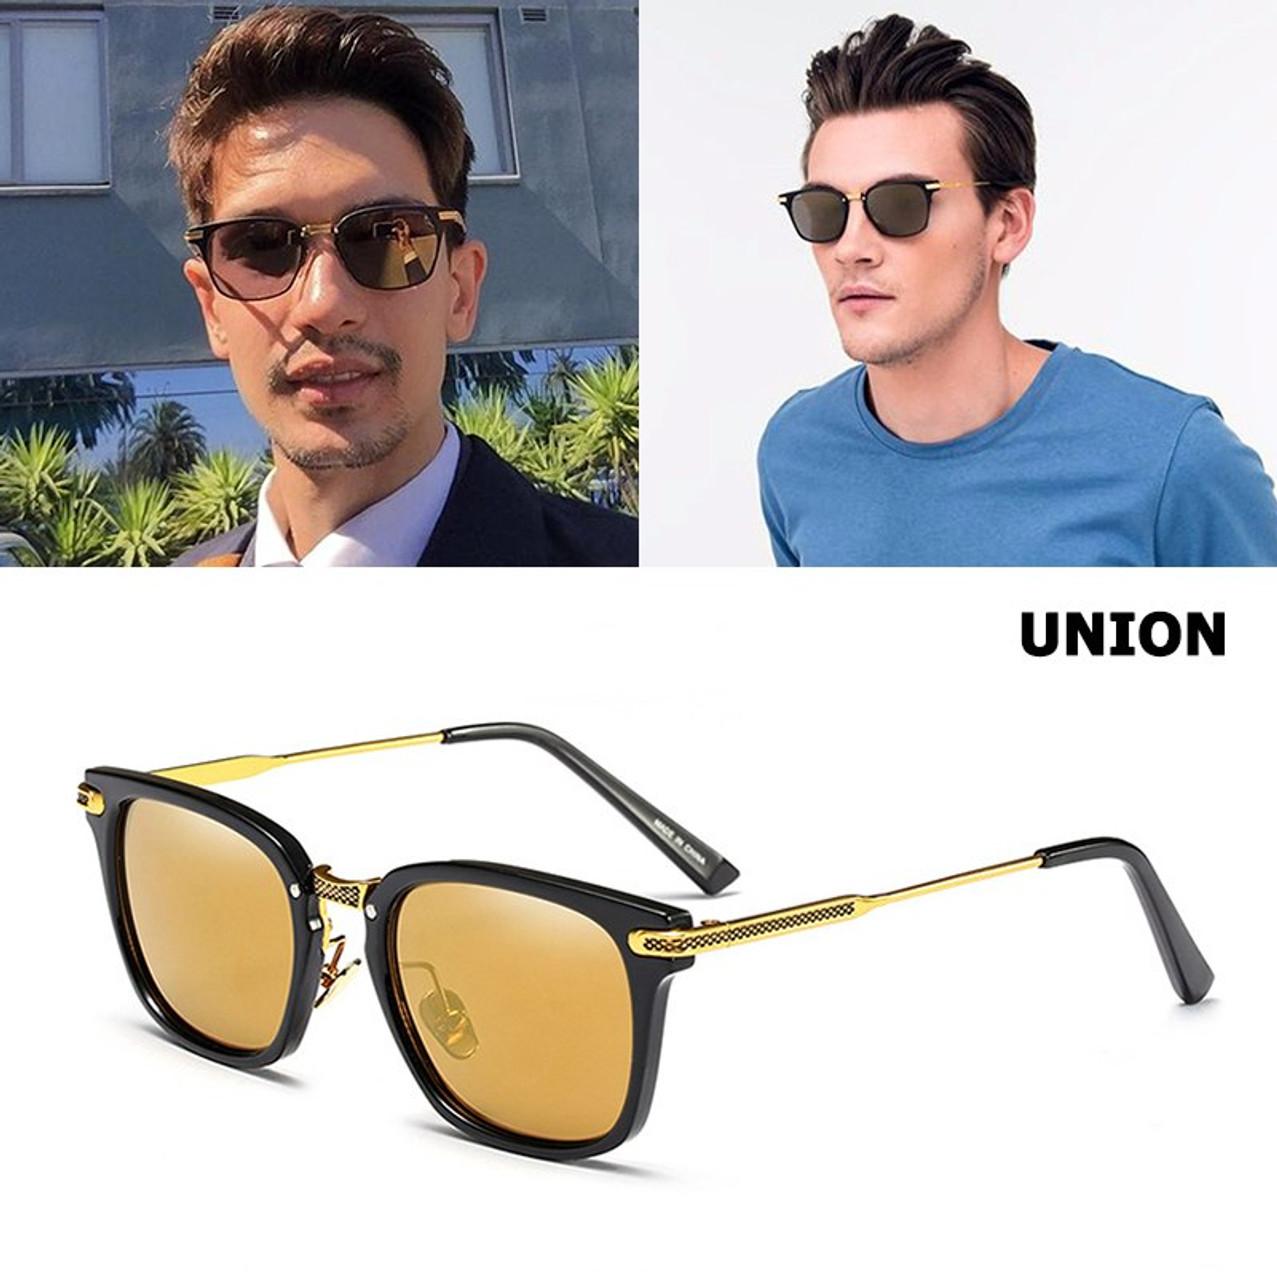 afd8d1742a6d4 JackJad 2018 Fashion Arrival The Union Sunglasses Men Women Brand Design  Square Frame Style Sun Glasses ...